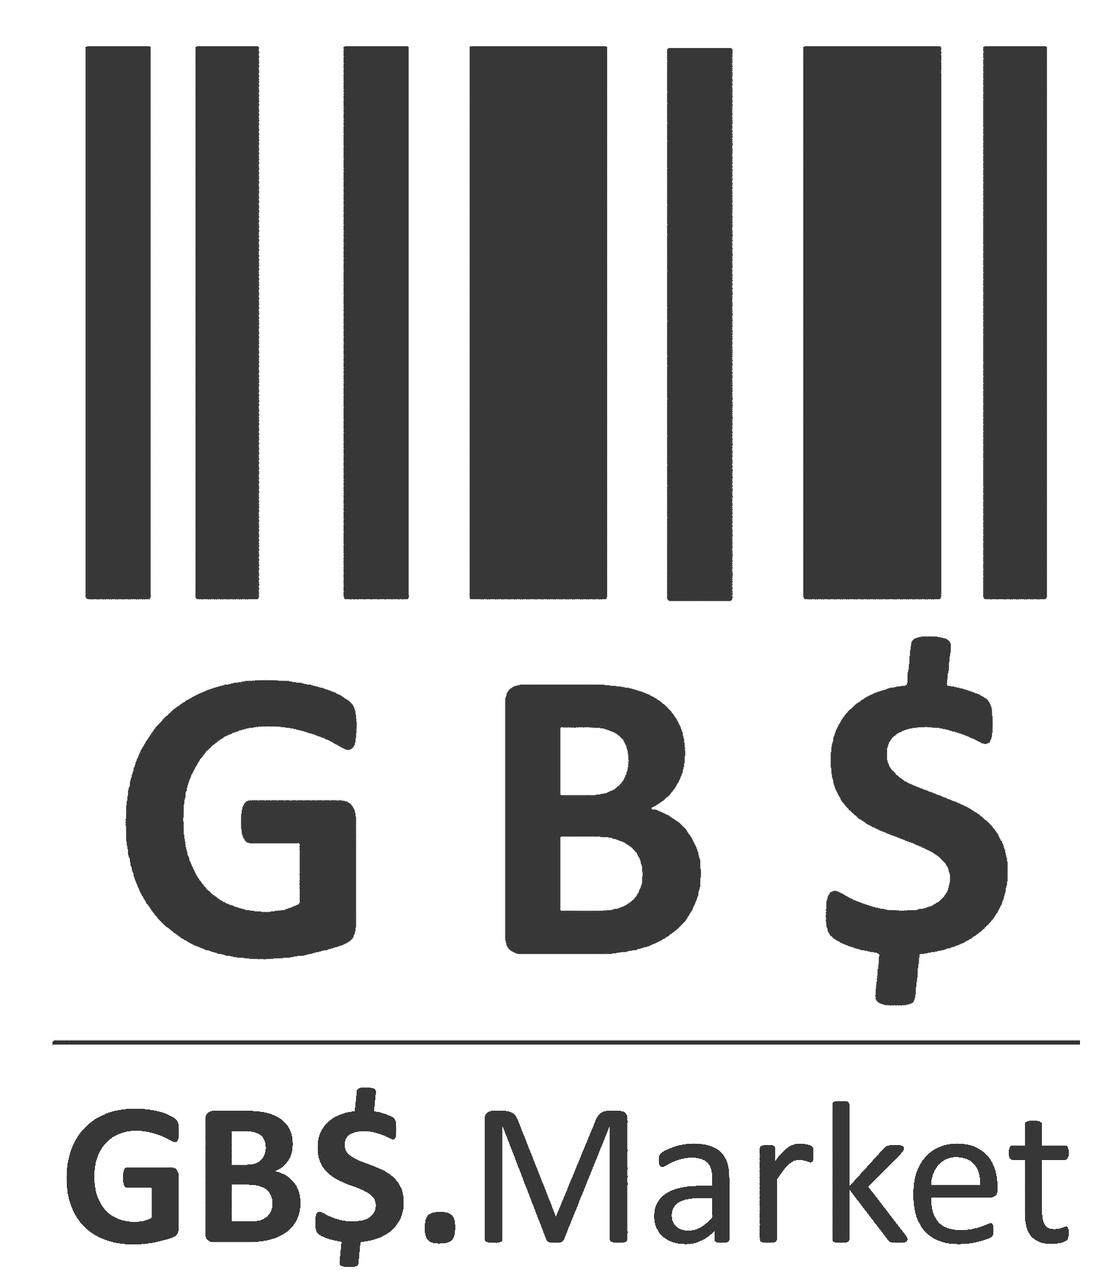 Программа для автоматизации учета торговли в магазине, бутике   GBS Market